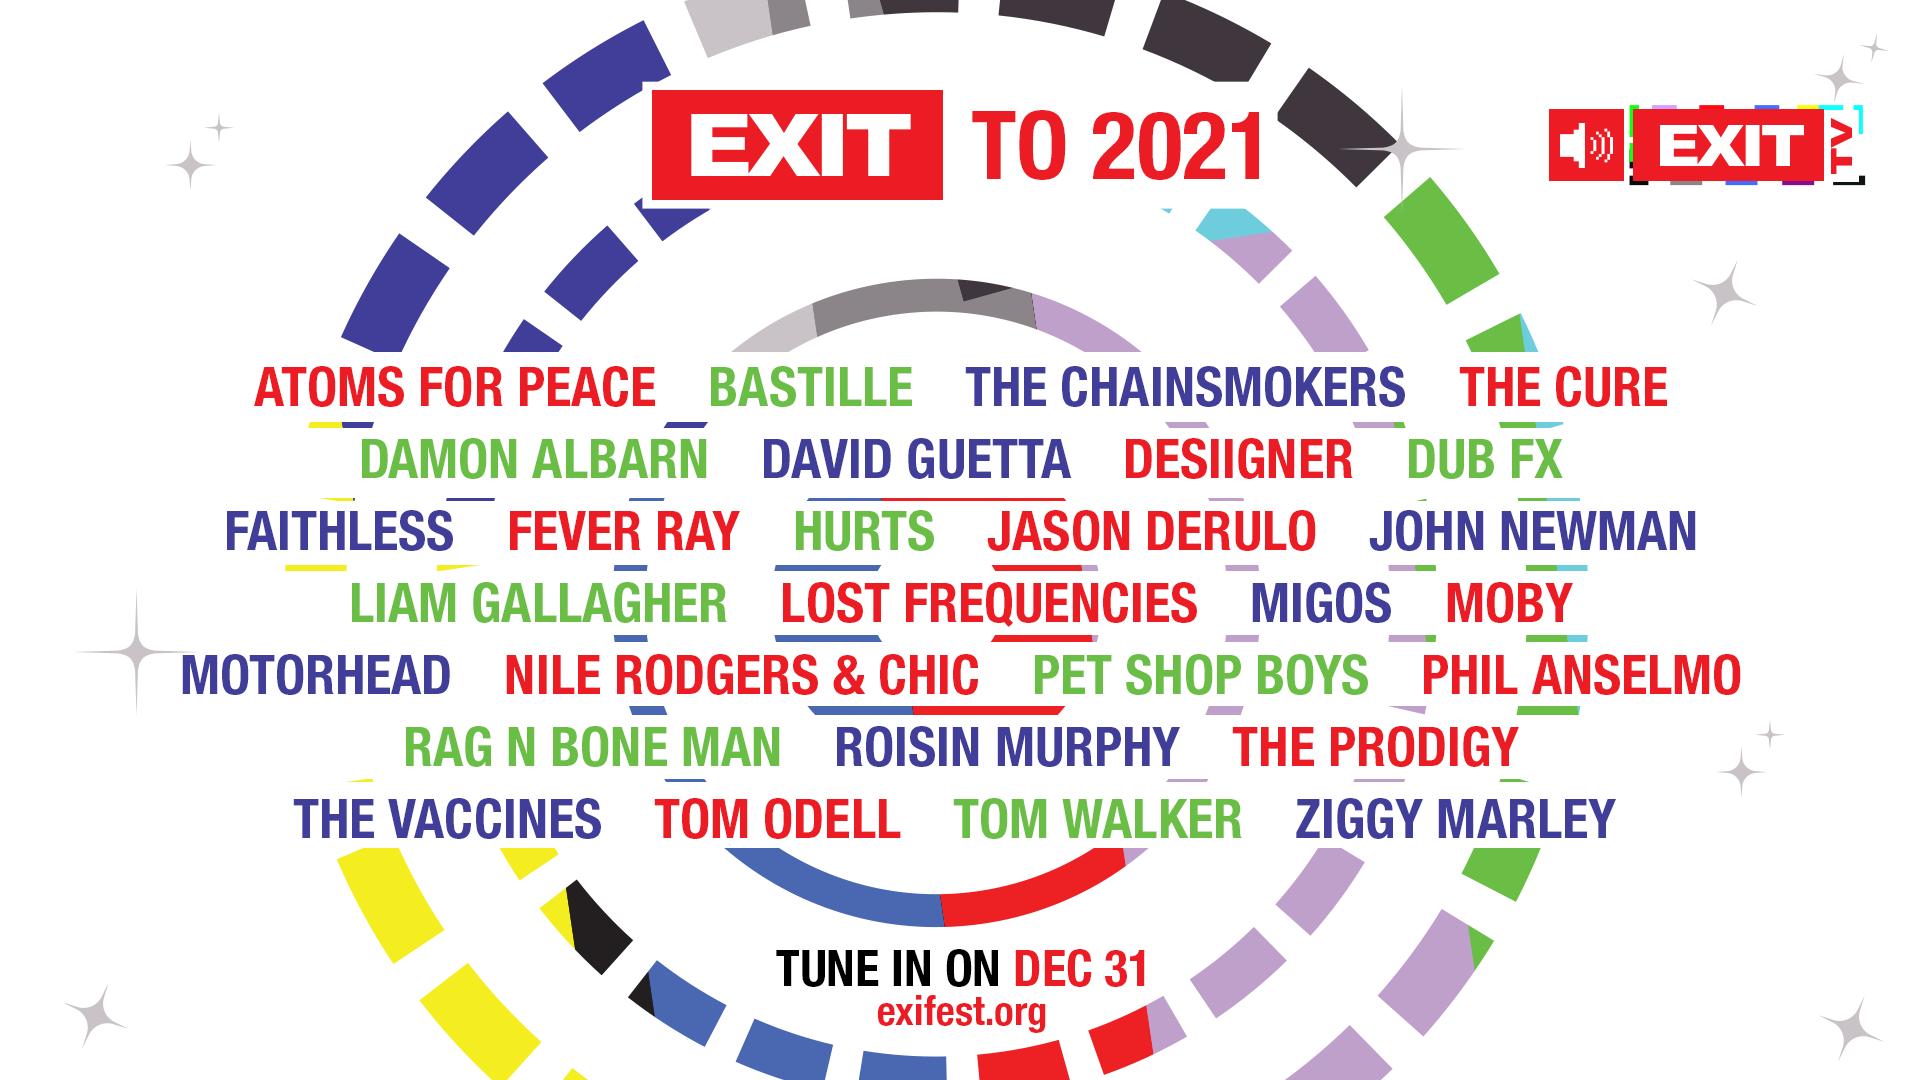 EXIT to 2021: Влезте в Нова година с The Prodigy, The Cure, David Guetta, Migos и много други!